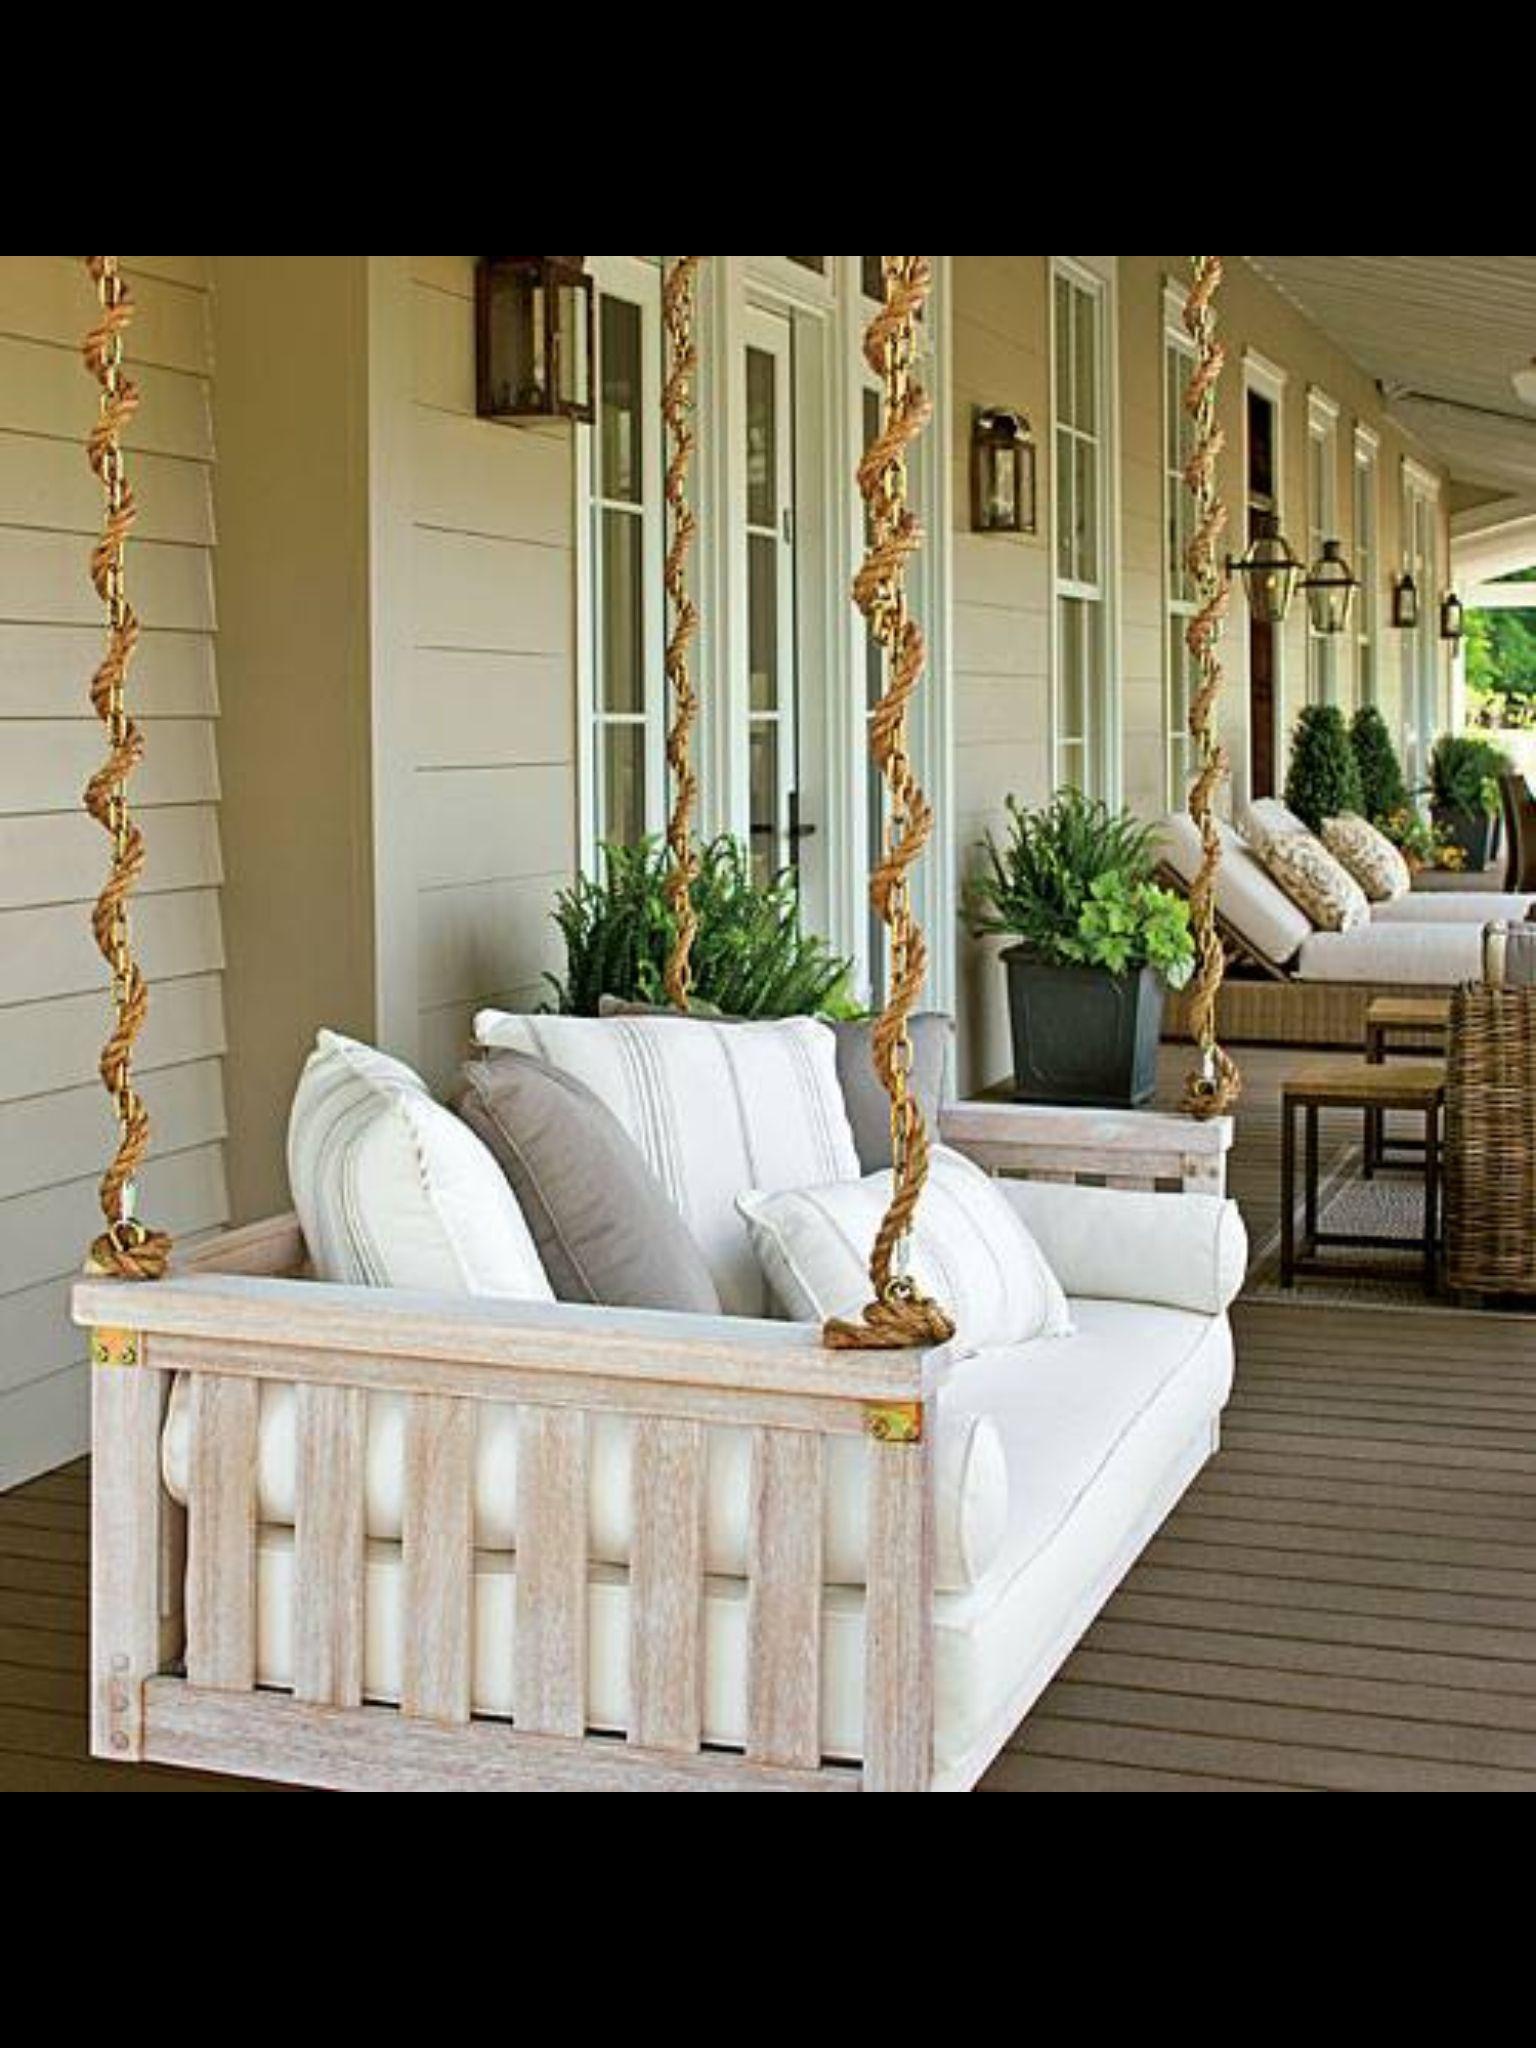 FARM PLAN wrap around porch swing love the